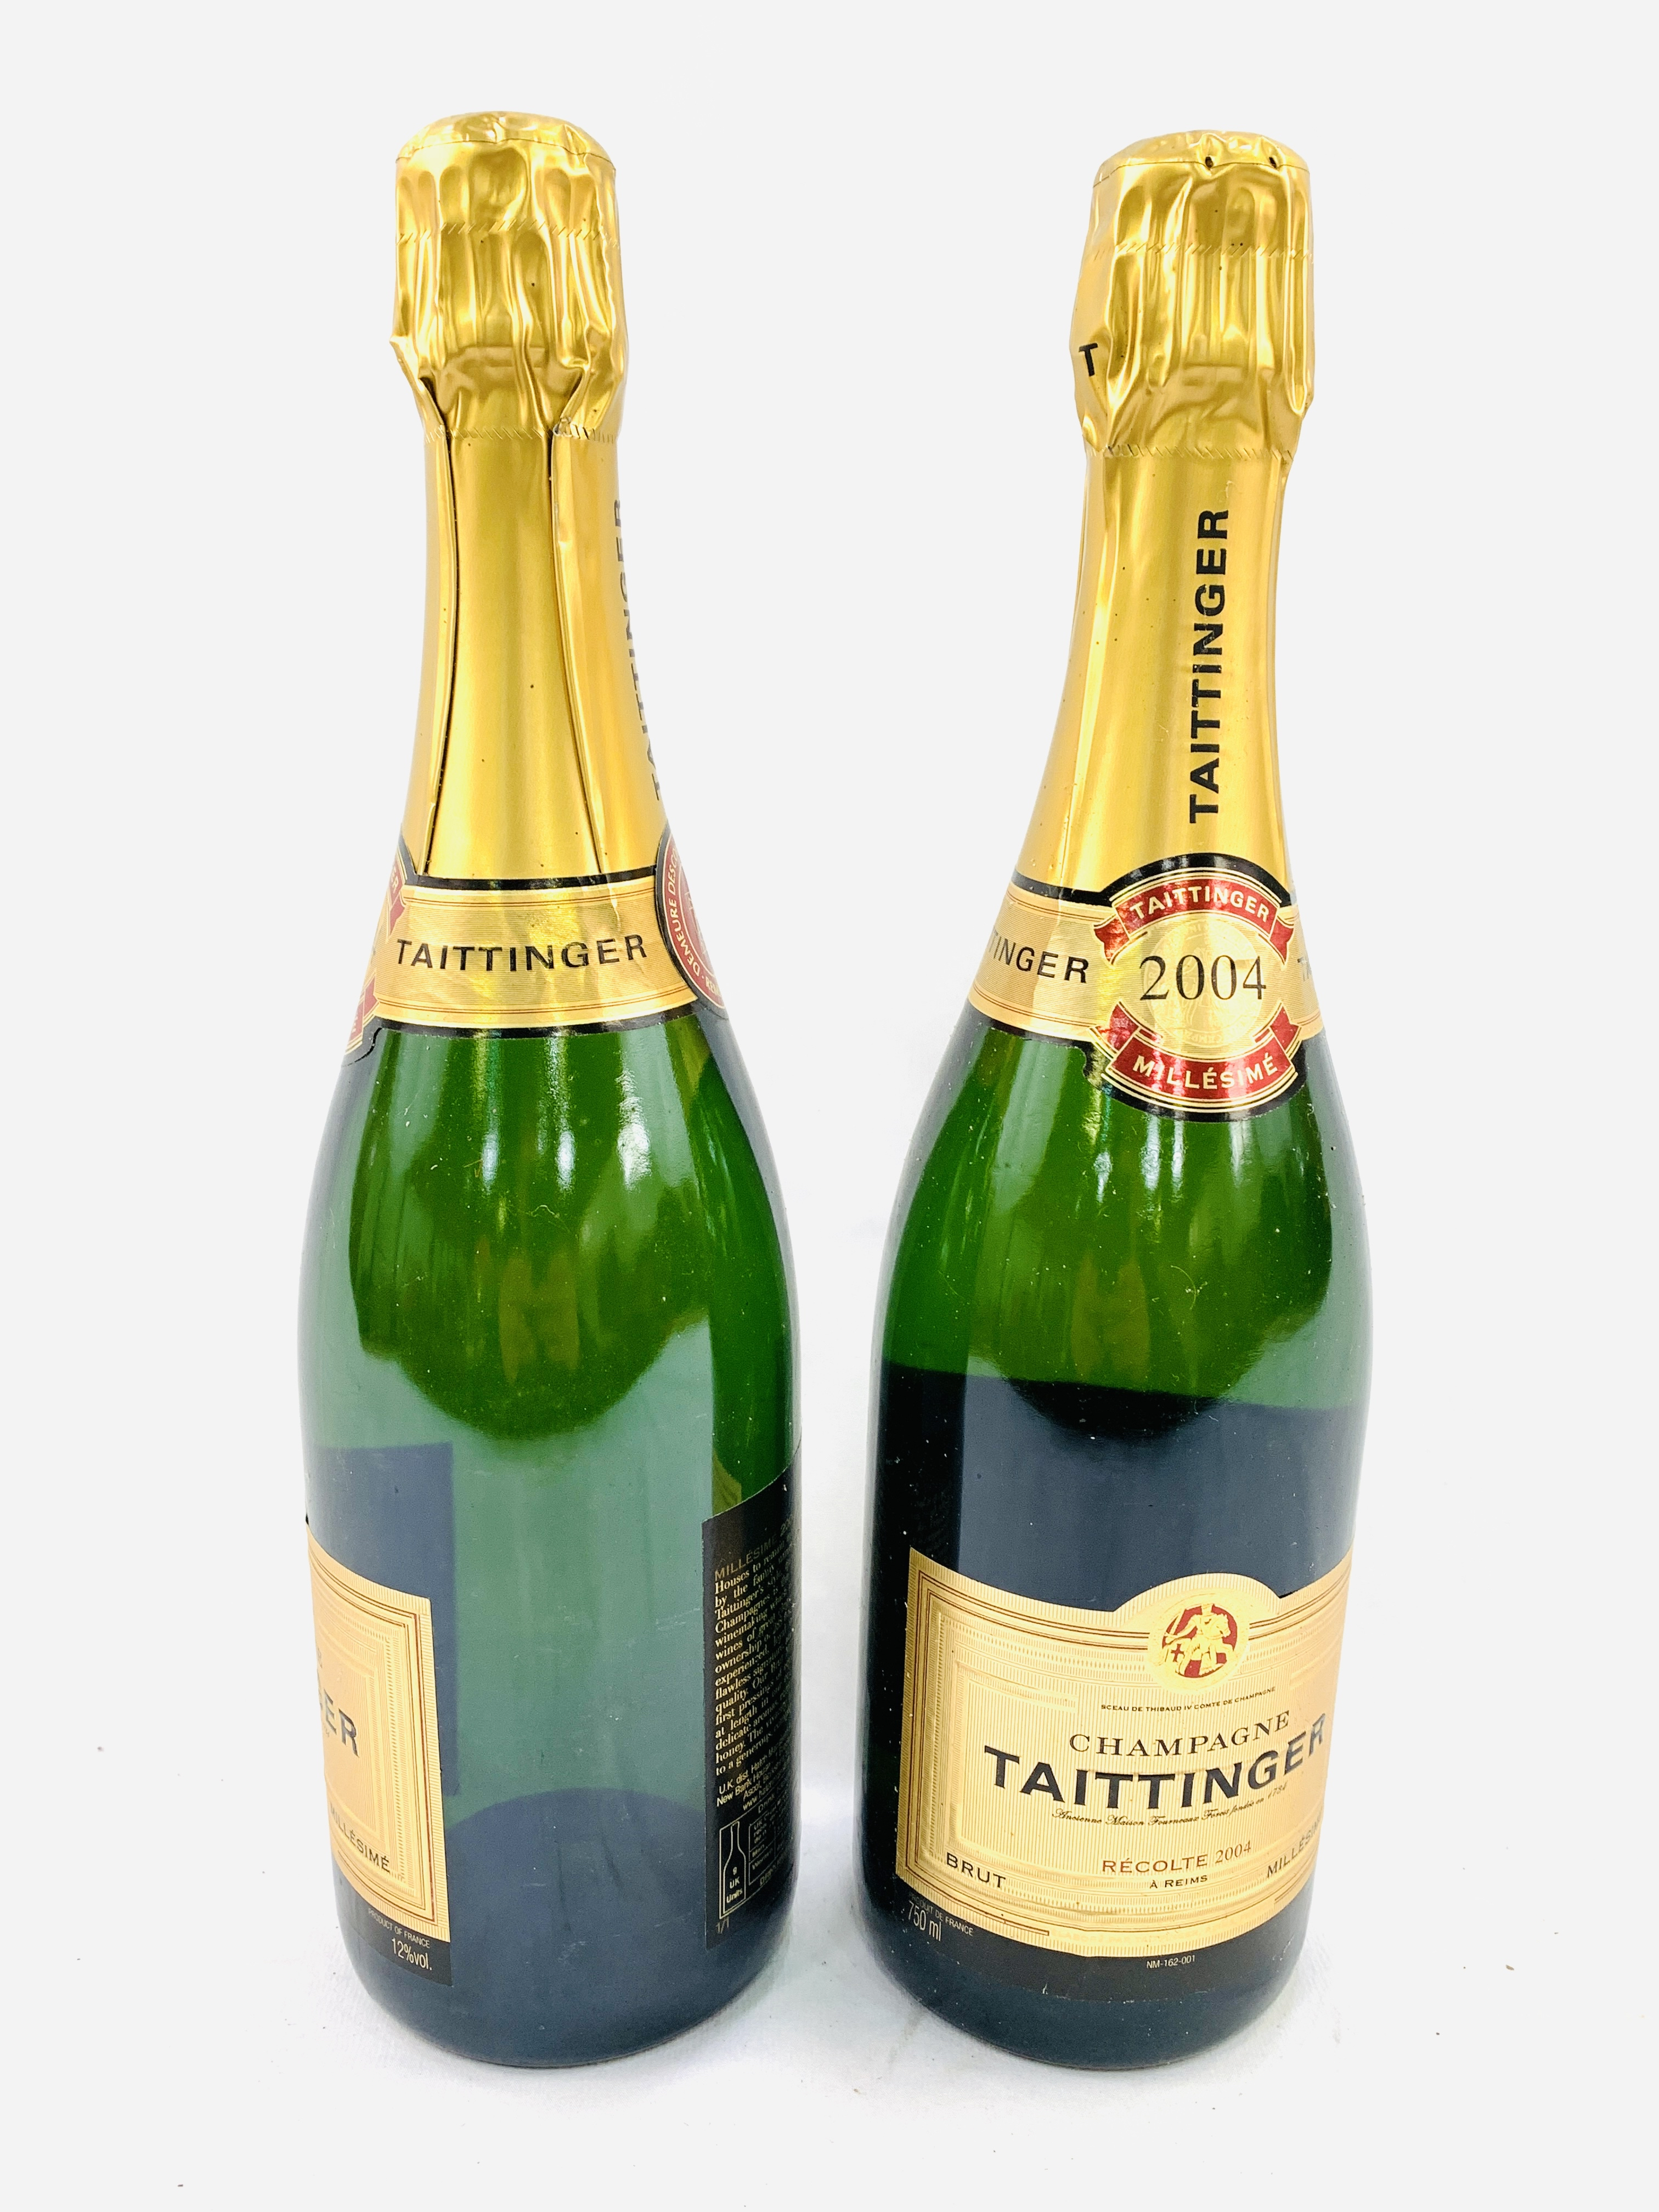 Two 75cl bottles of 2004 Taittinger Brut Millesime champagne - Image 2 of 3